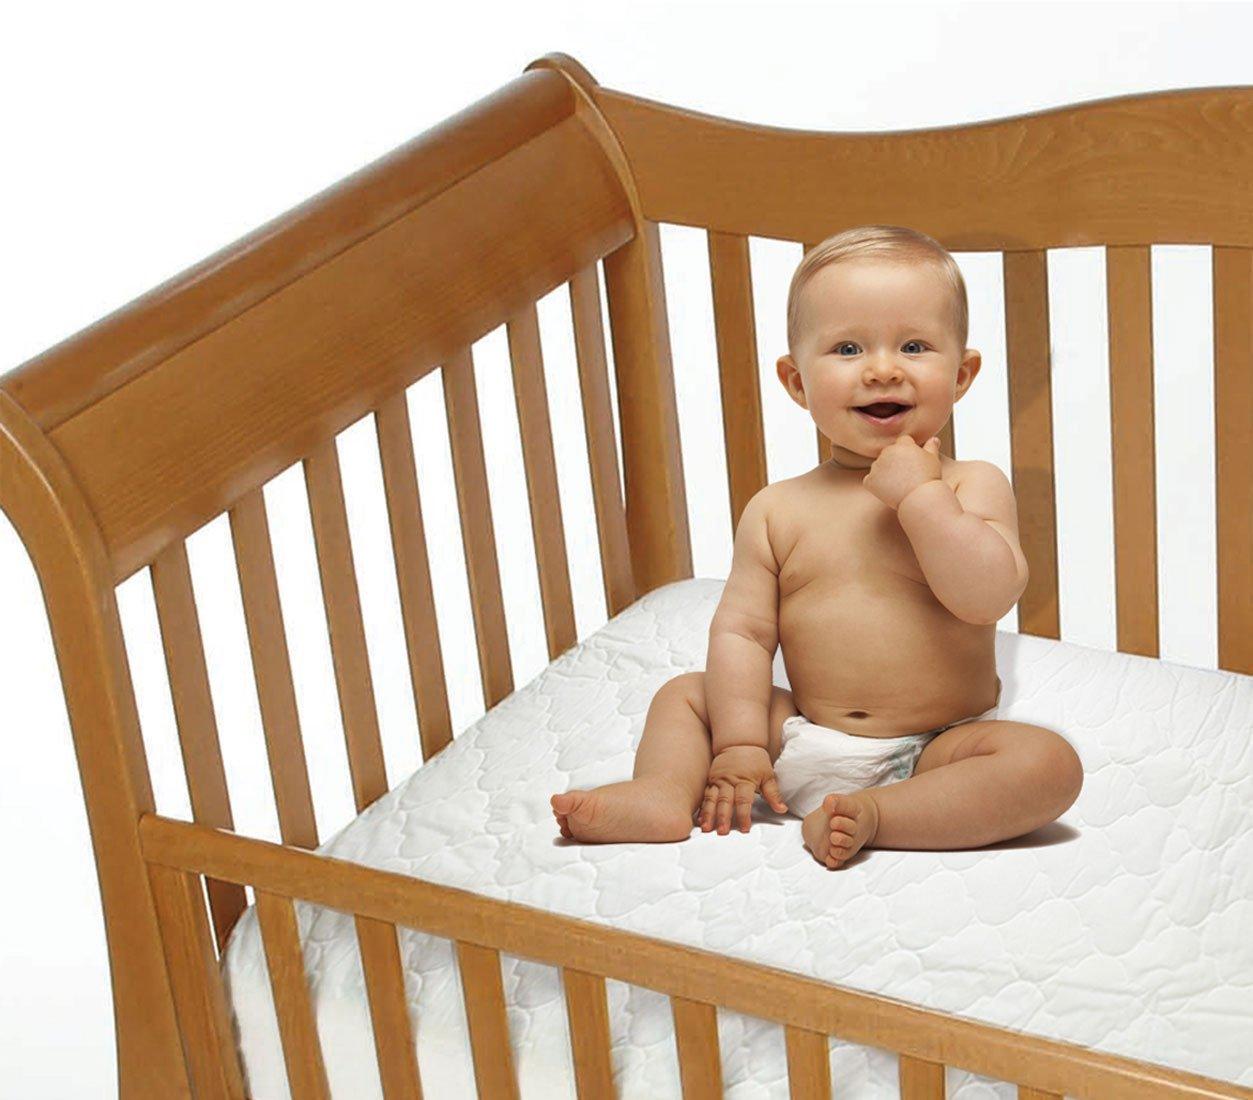 kekafu Soft Baby Crib Protector Crib Pillow Cushion Infant Soft Pad Braided Crib Protection Newborn Gift Bed Snake Braided Protector for Crib Cot Cradle Decor